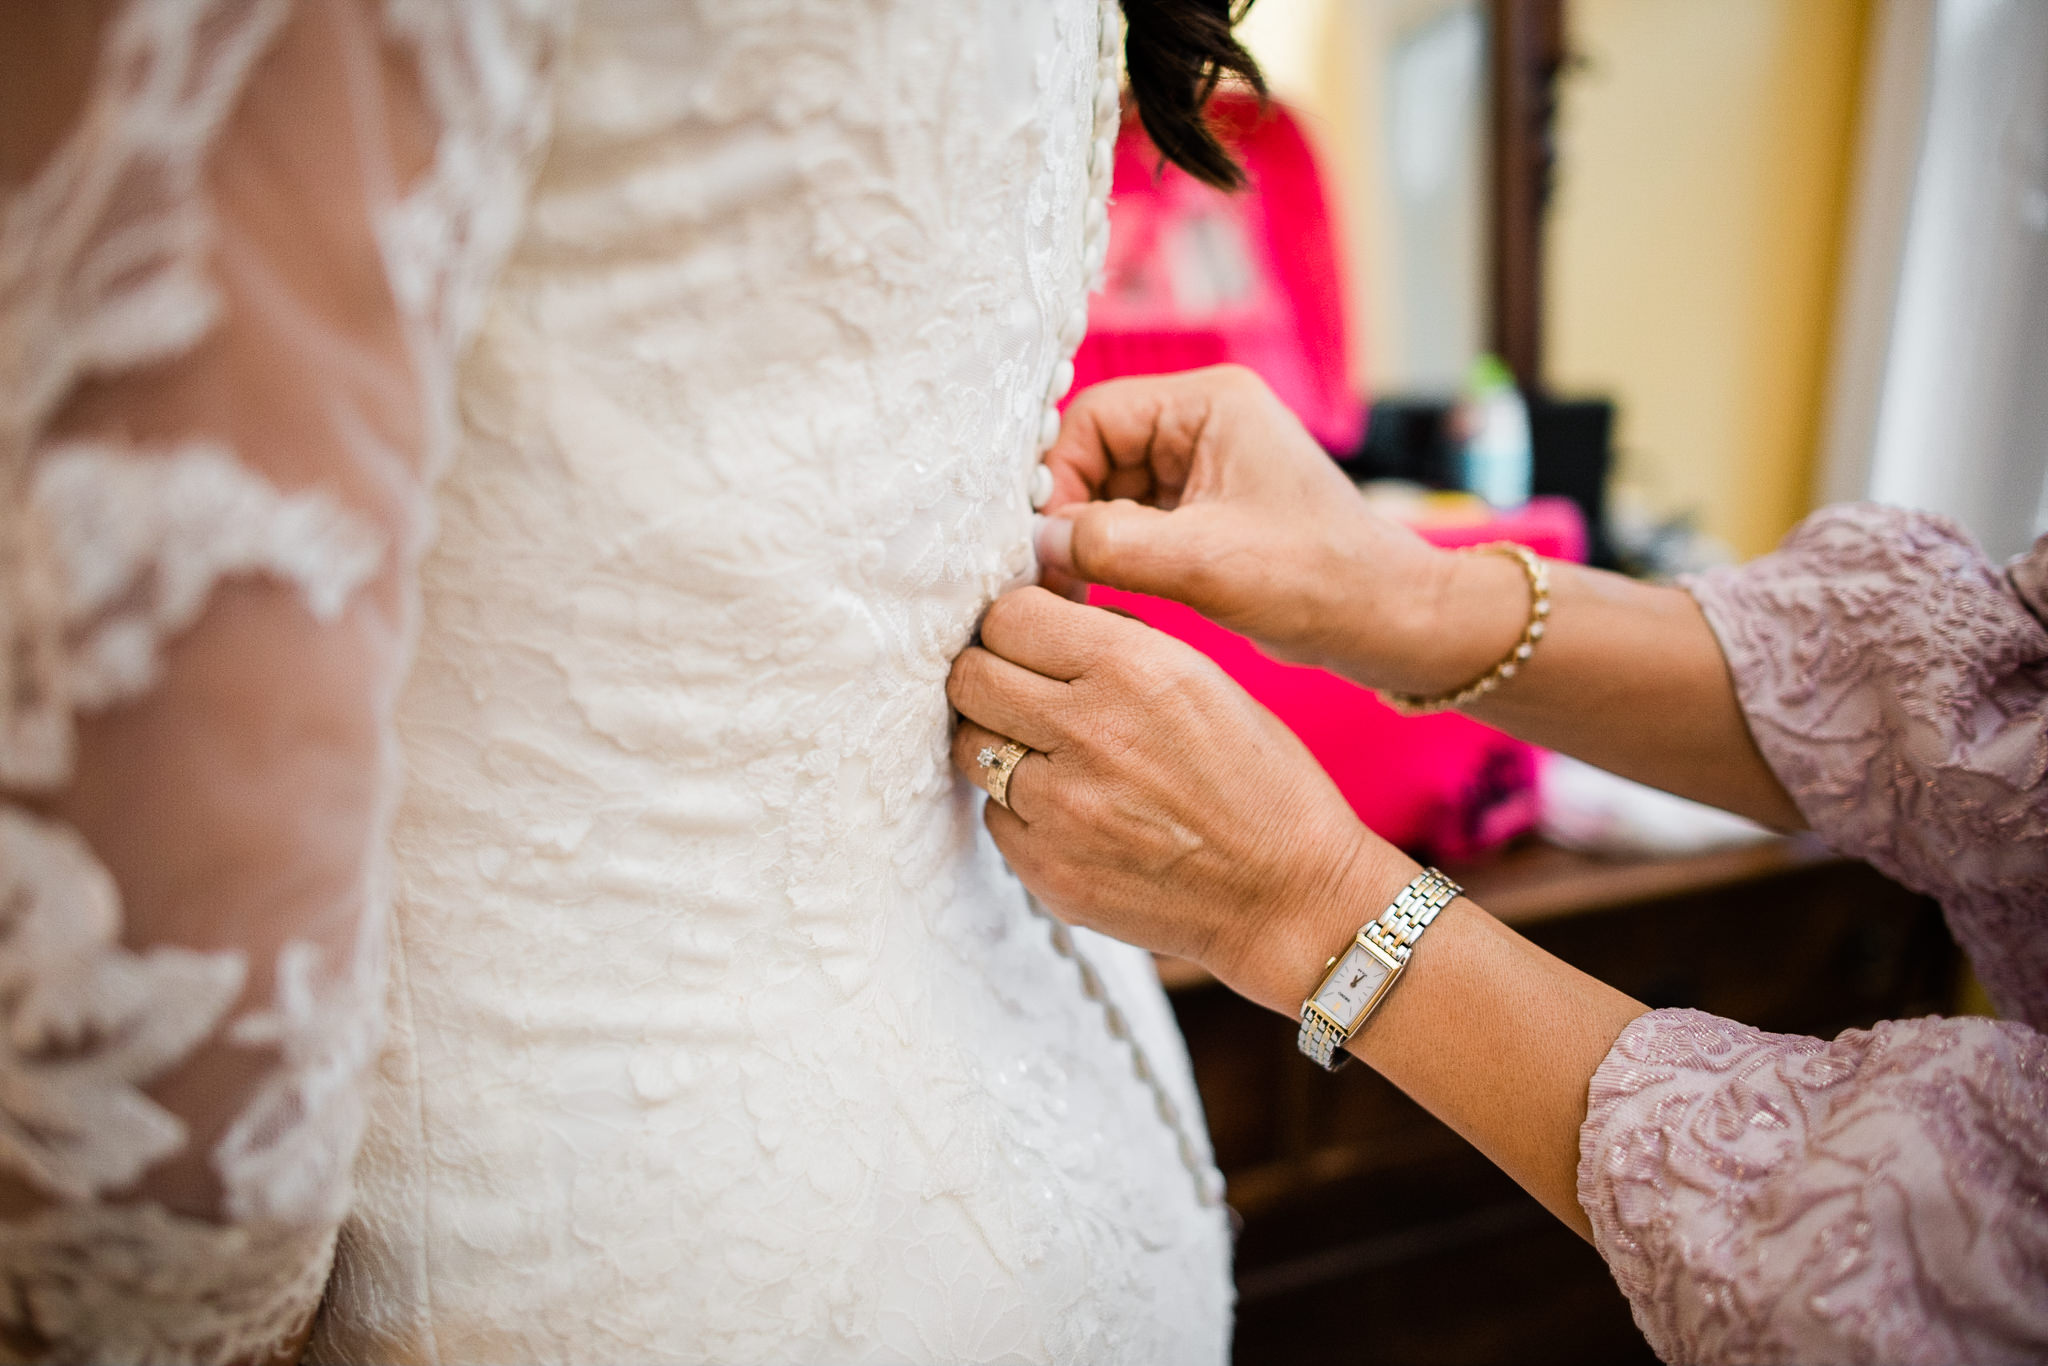 TAMPA_WEDDING_PHOTOGRAPHER_AAMZ_4307.jpg